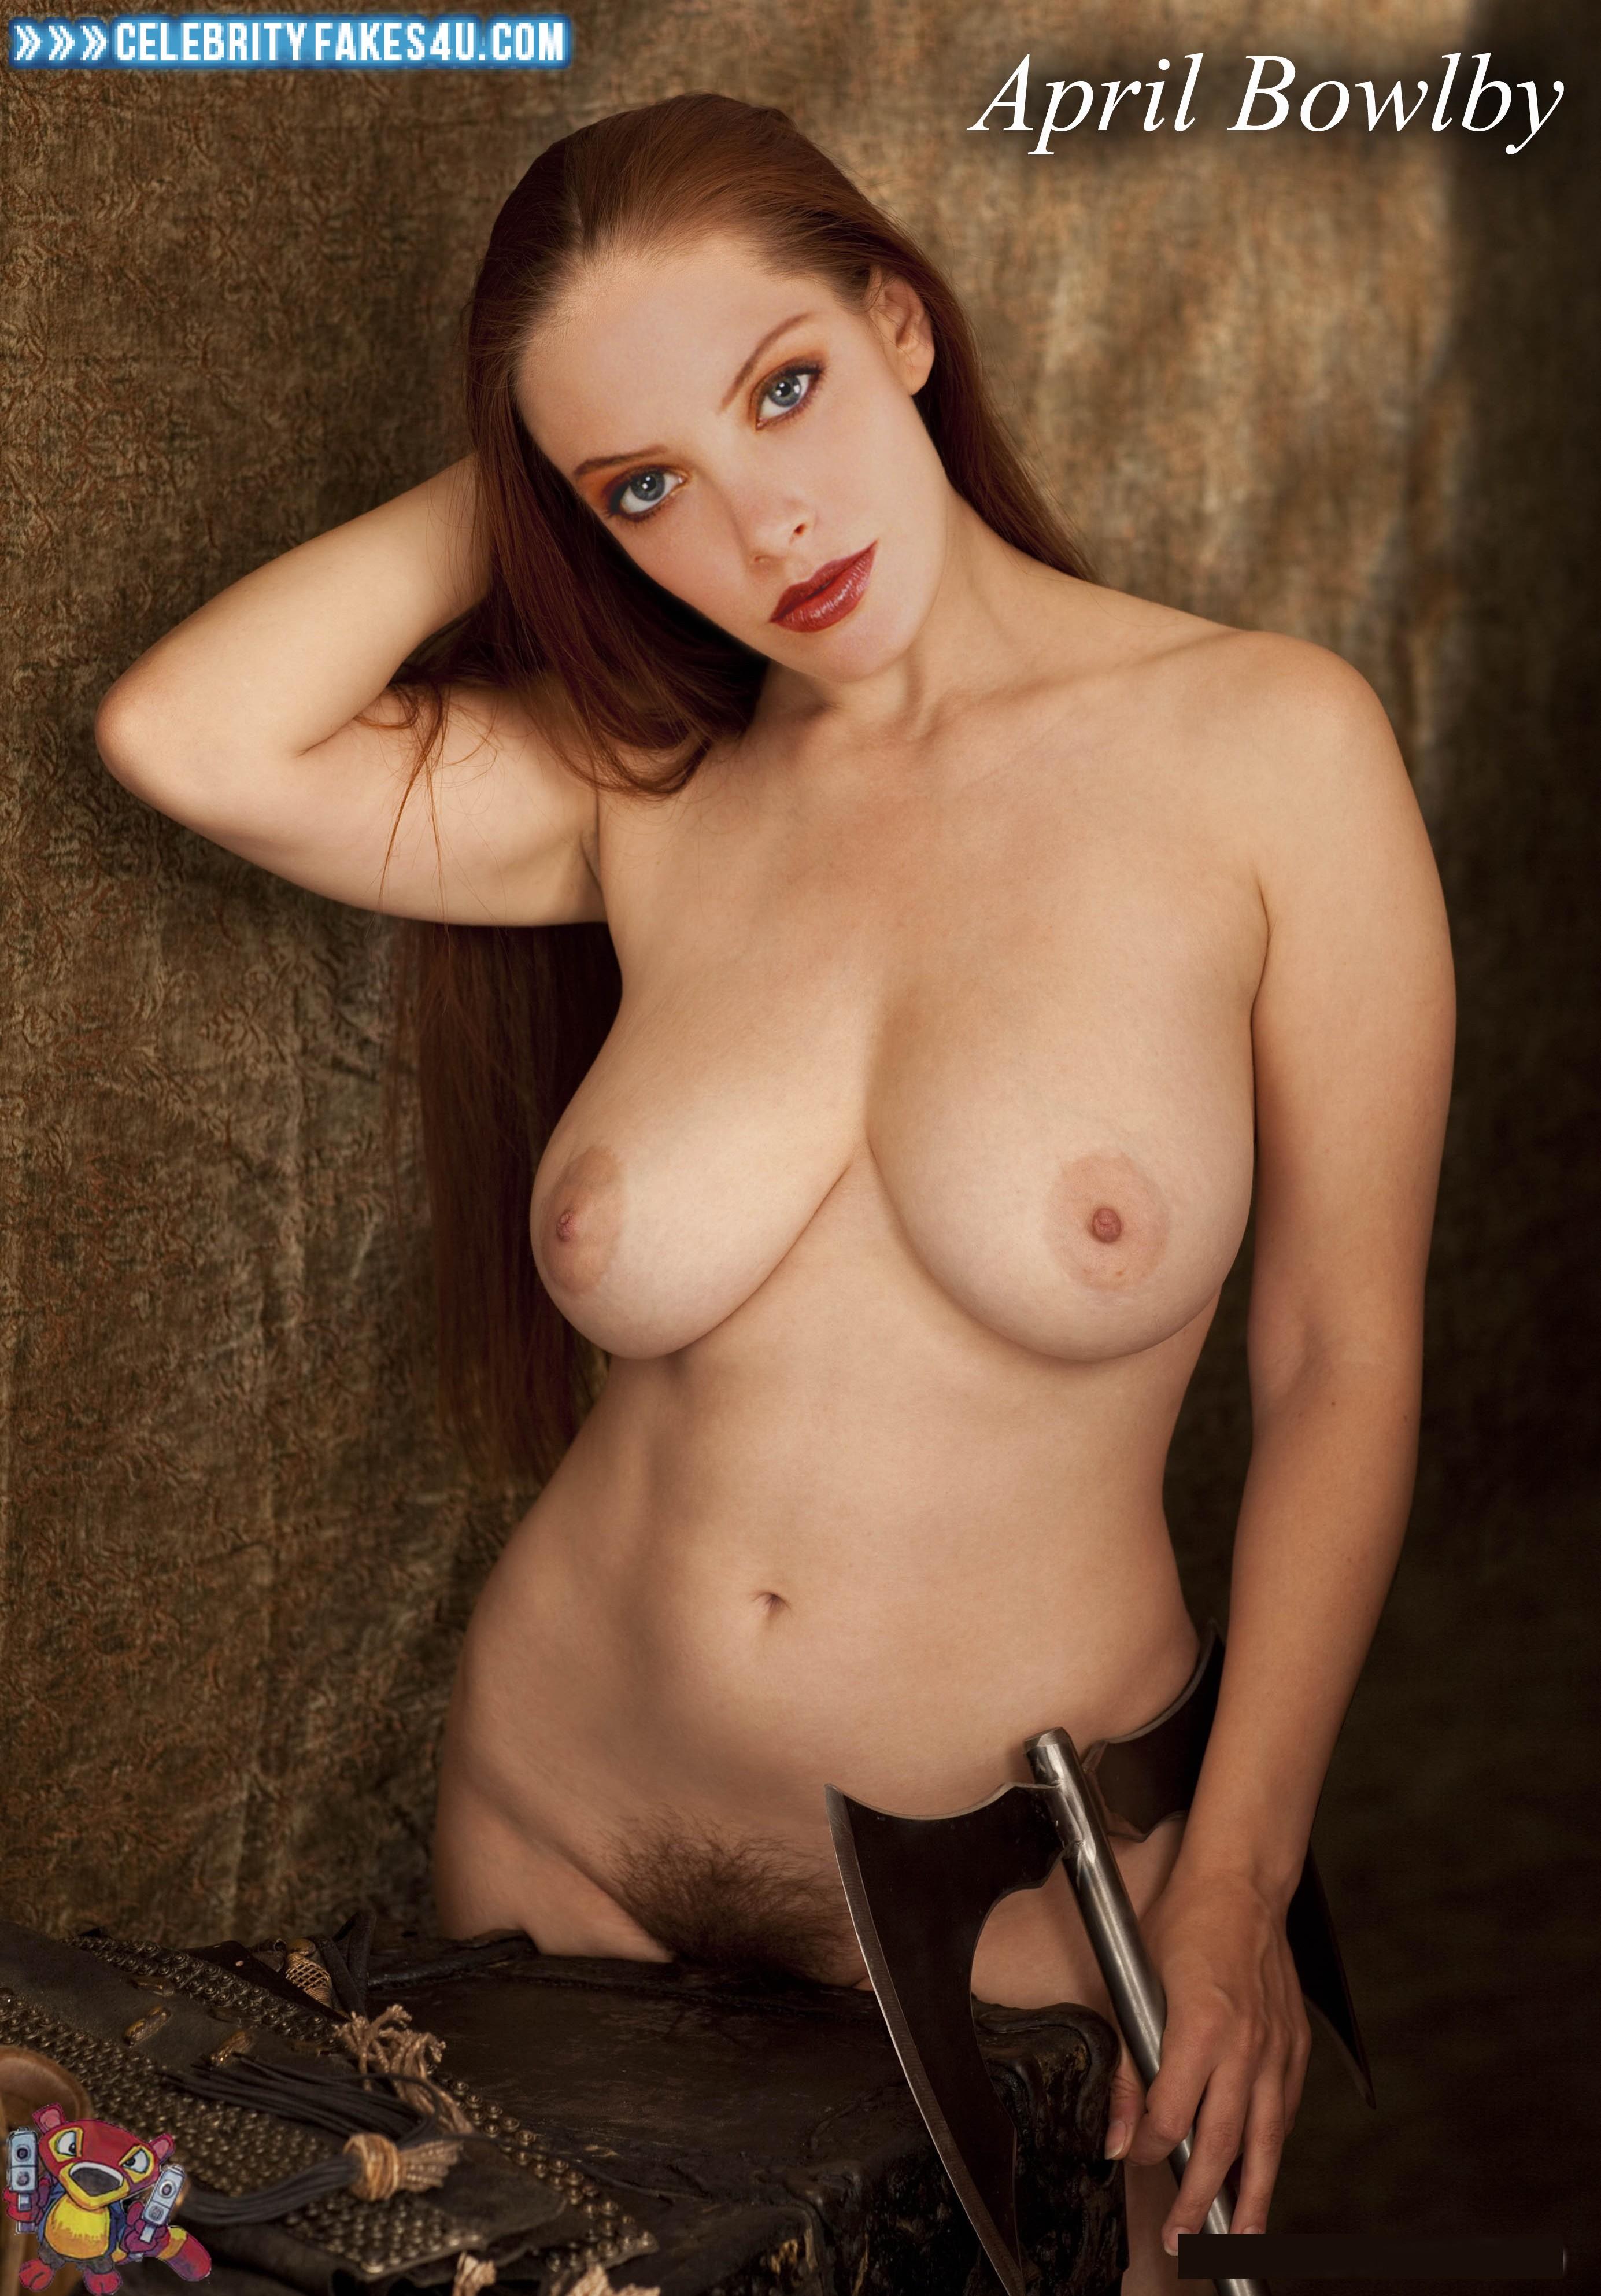 Hot girls pussy shots